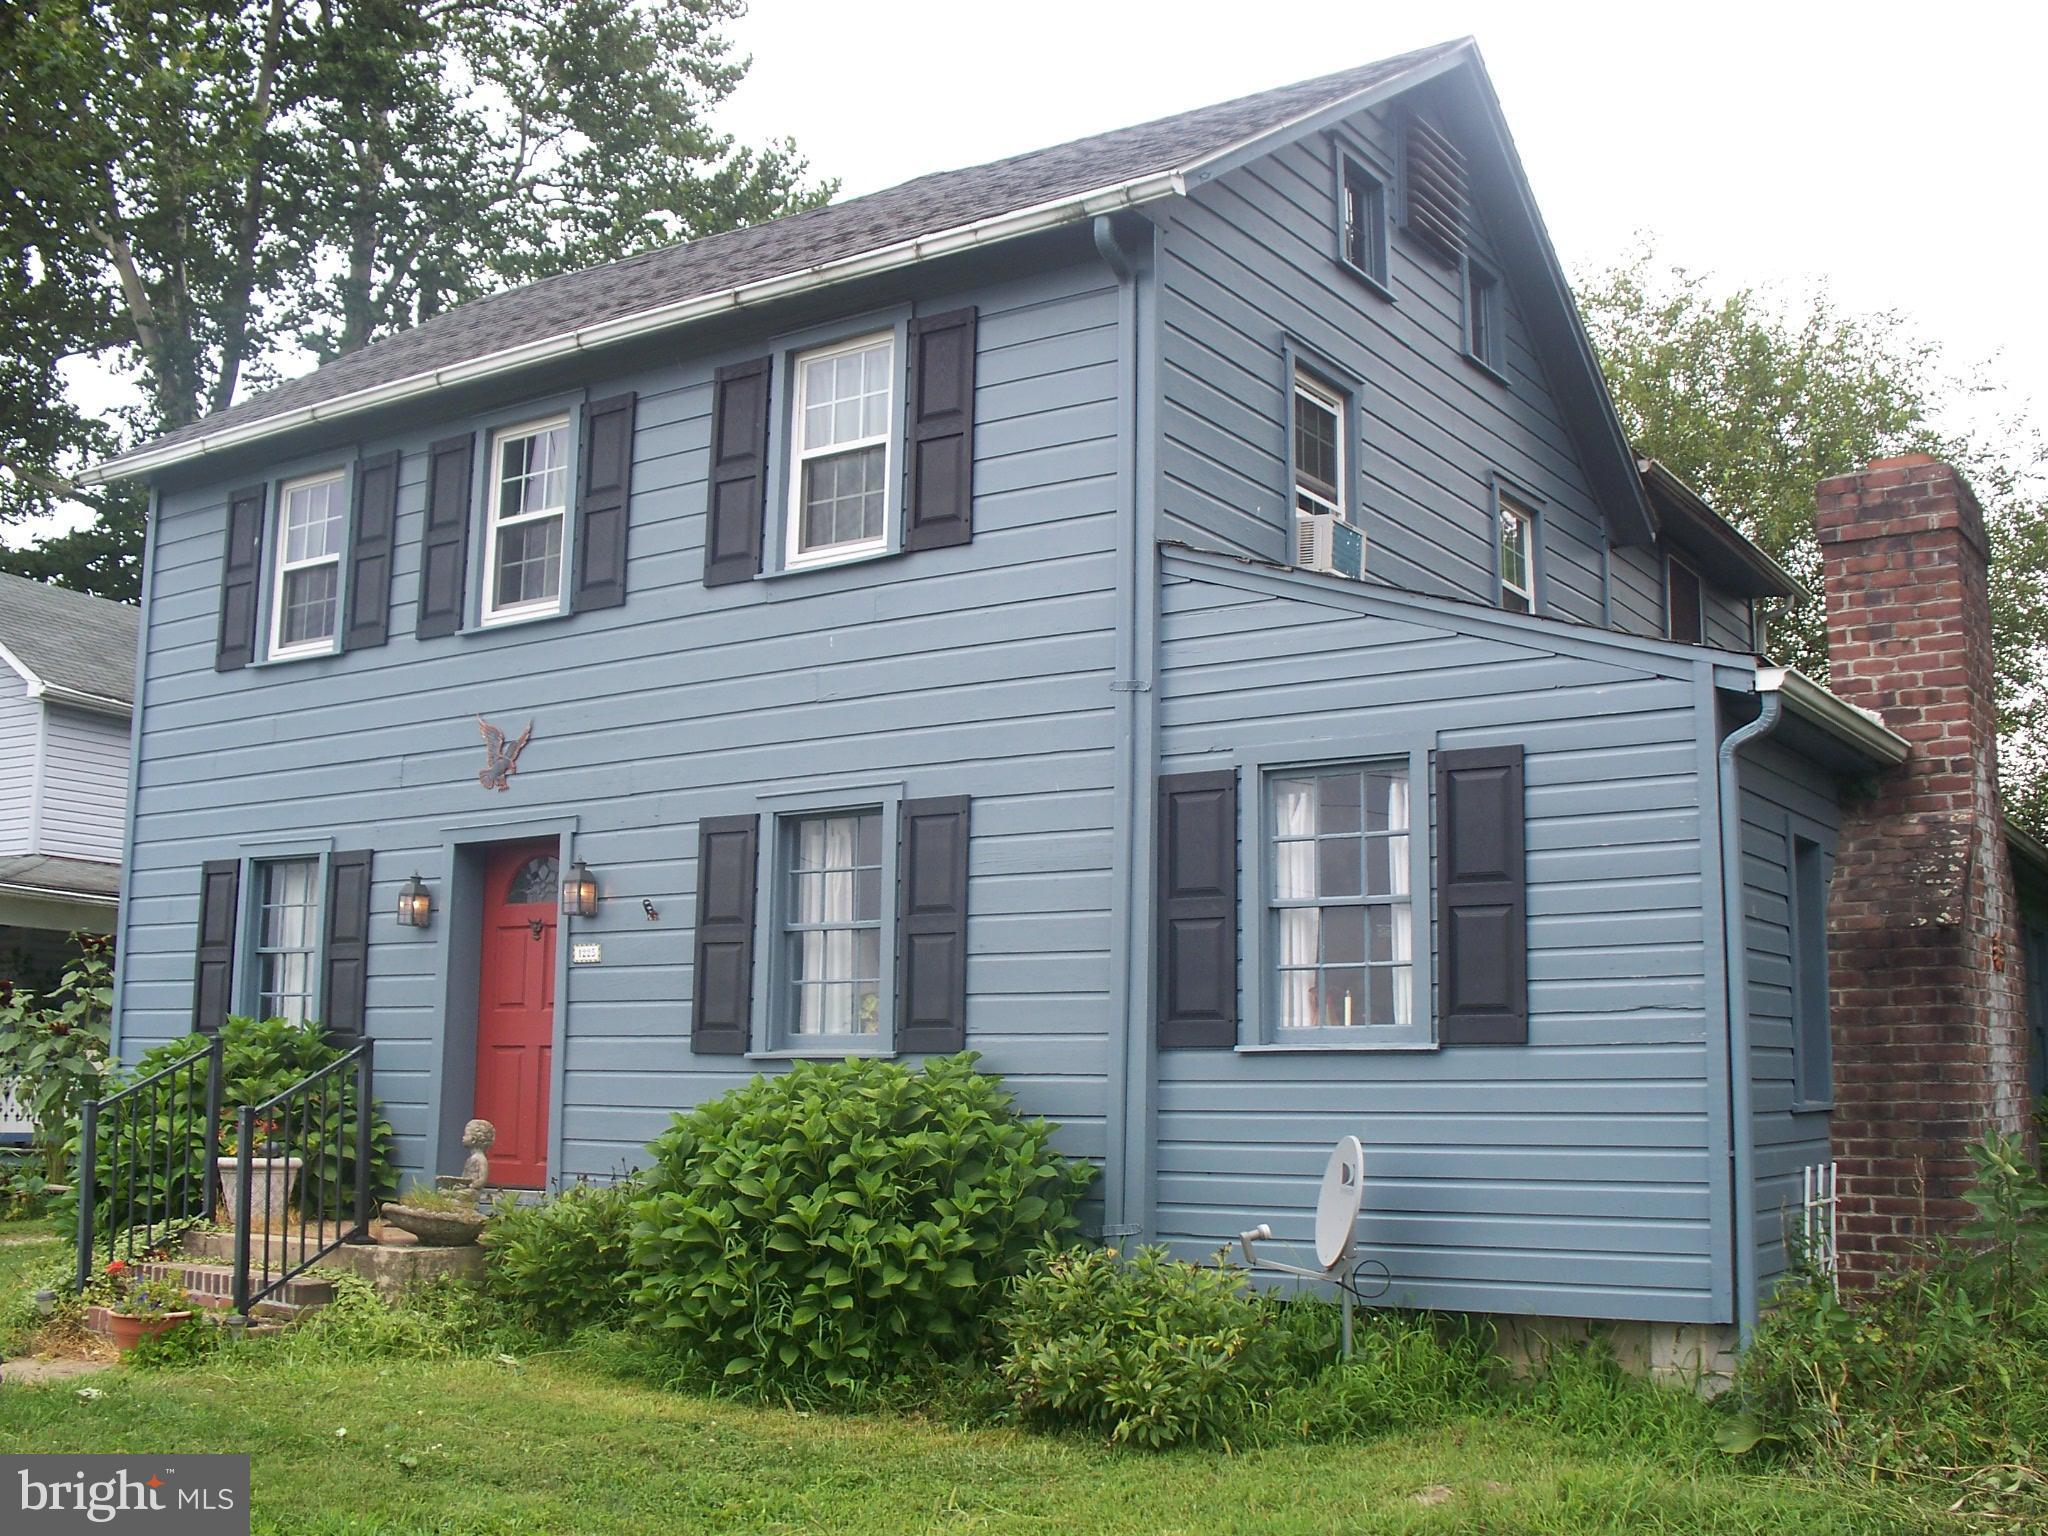 1225 BEECHERSTOWN ROAD, BIGLERVILLE, PA 17307